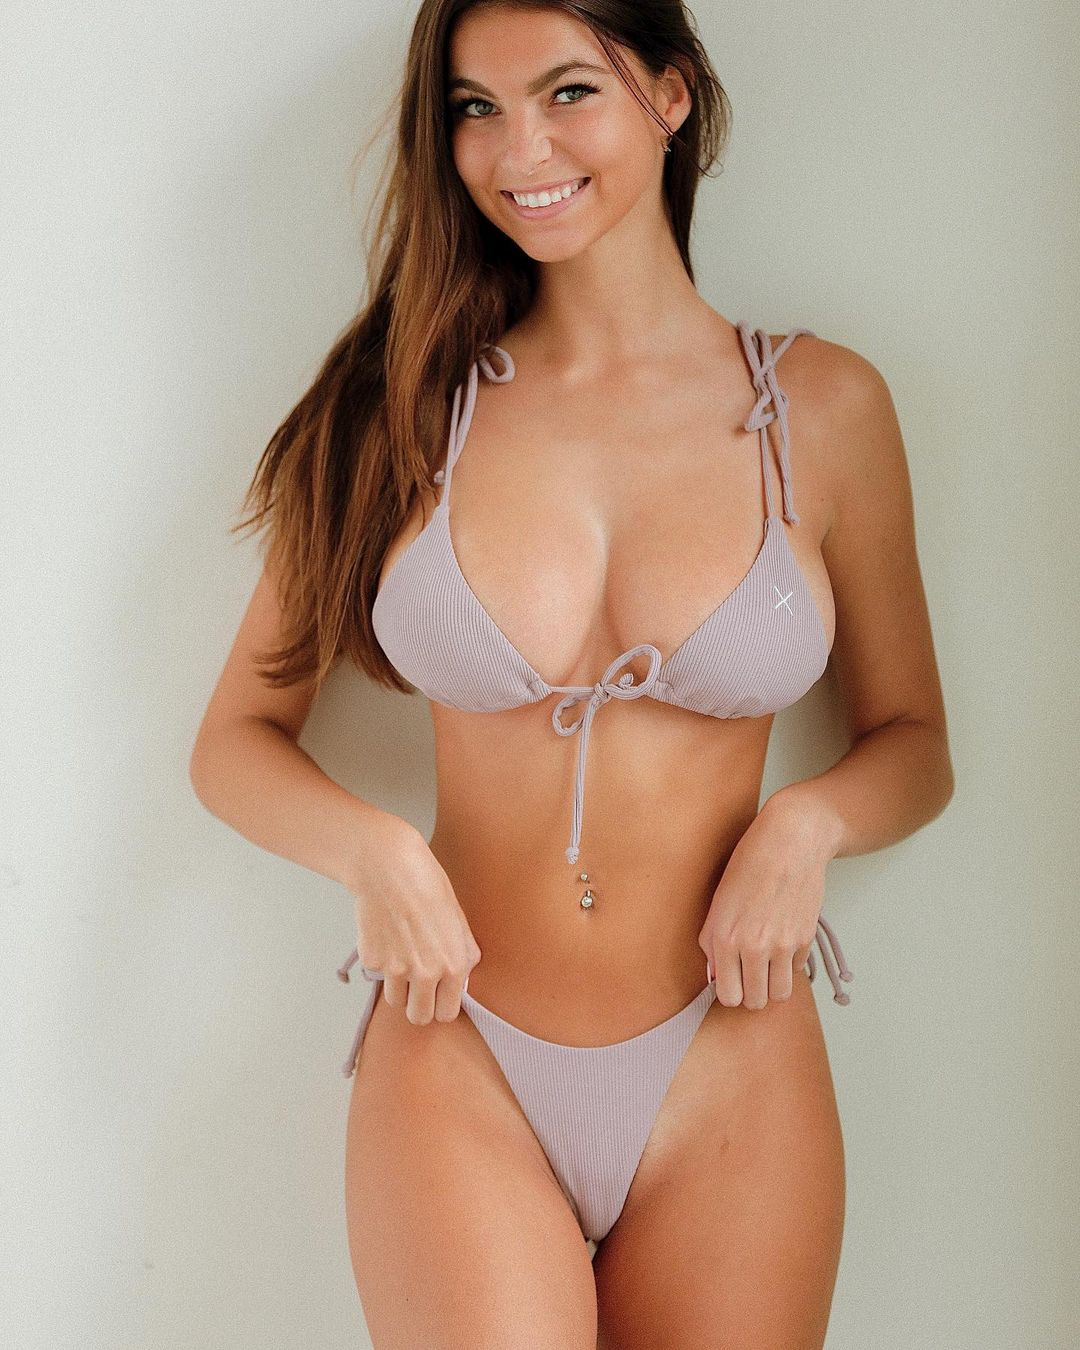 Grace Boor Nude Onlyfans Leaked 0023